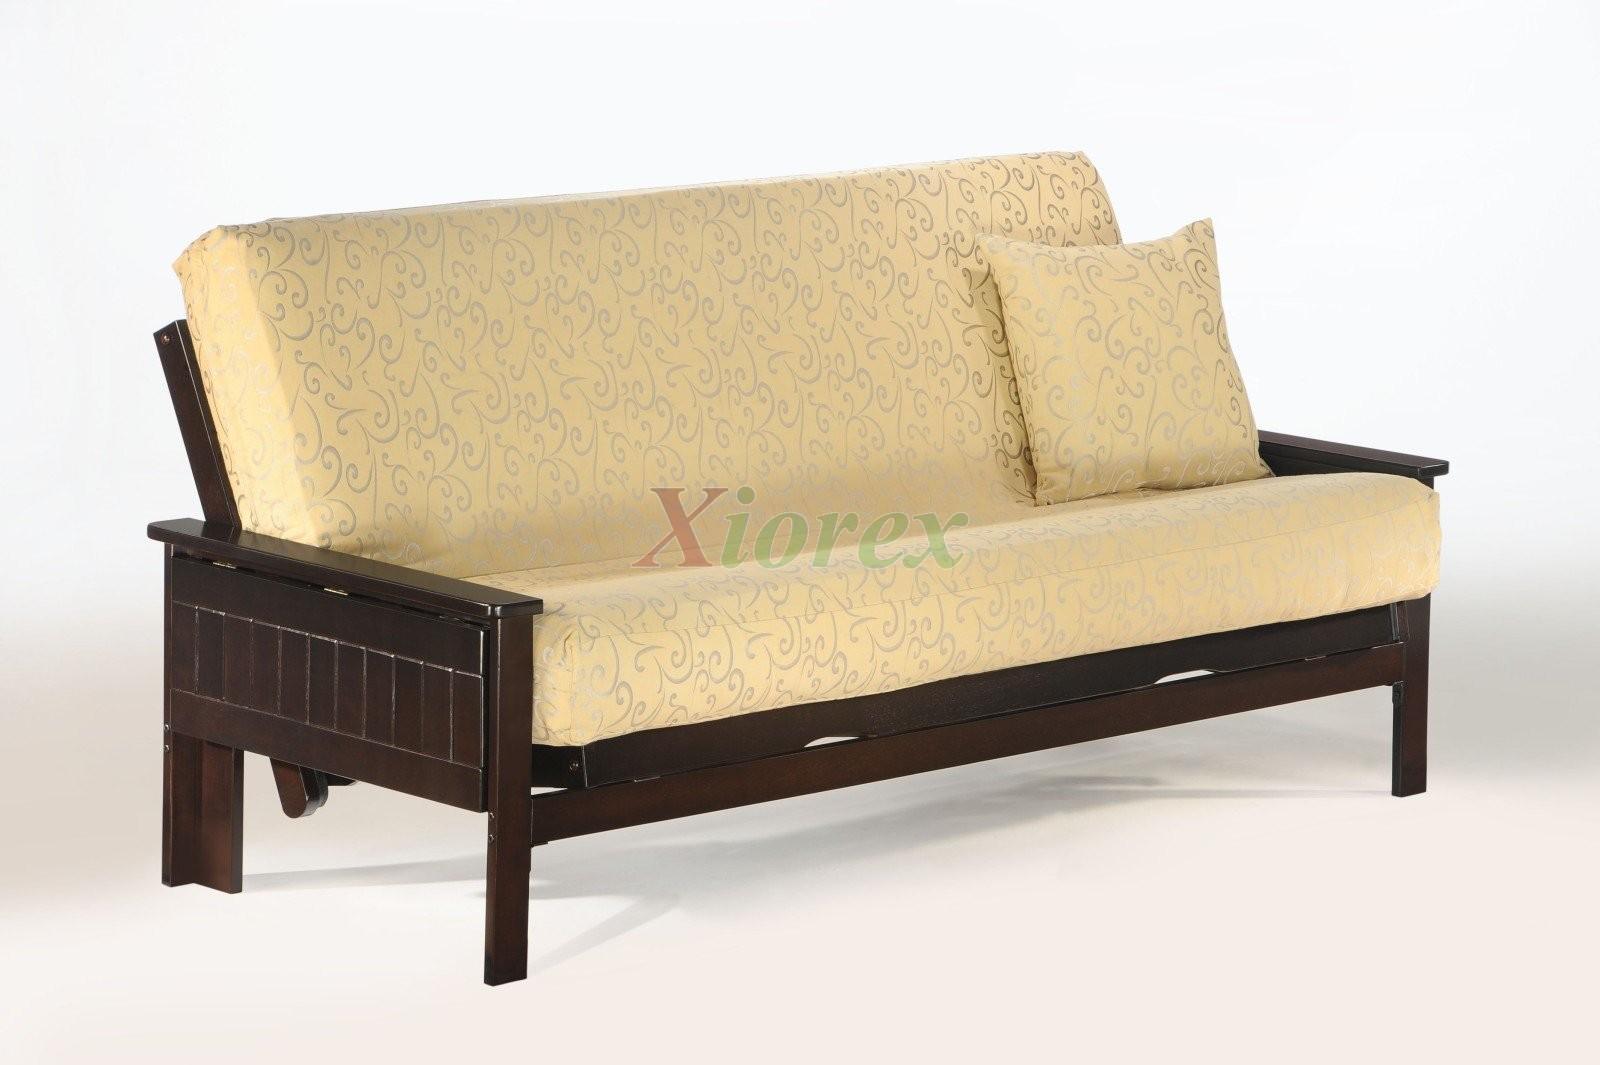 seattle futon by night and day dark chocolate futon convertible   xiorex night and day seattle futon convertible   xiorex  rh   xiorex